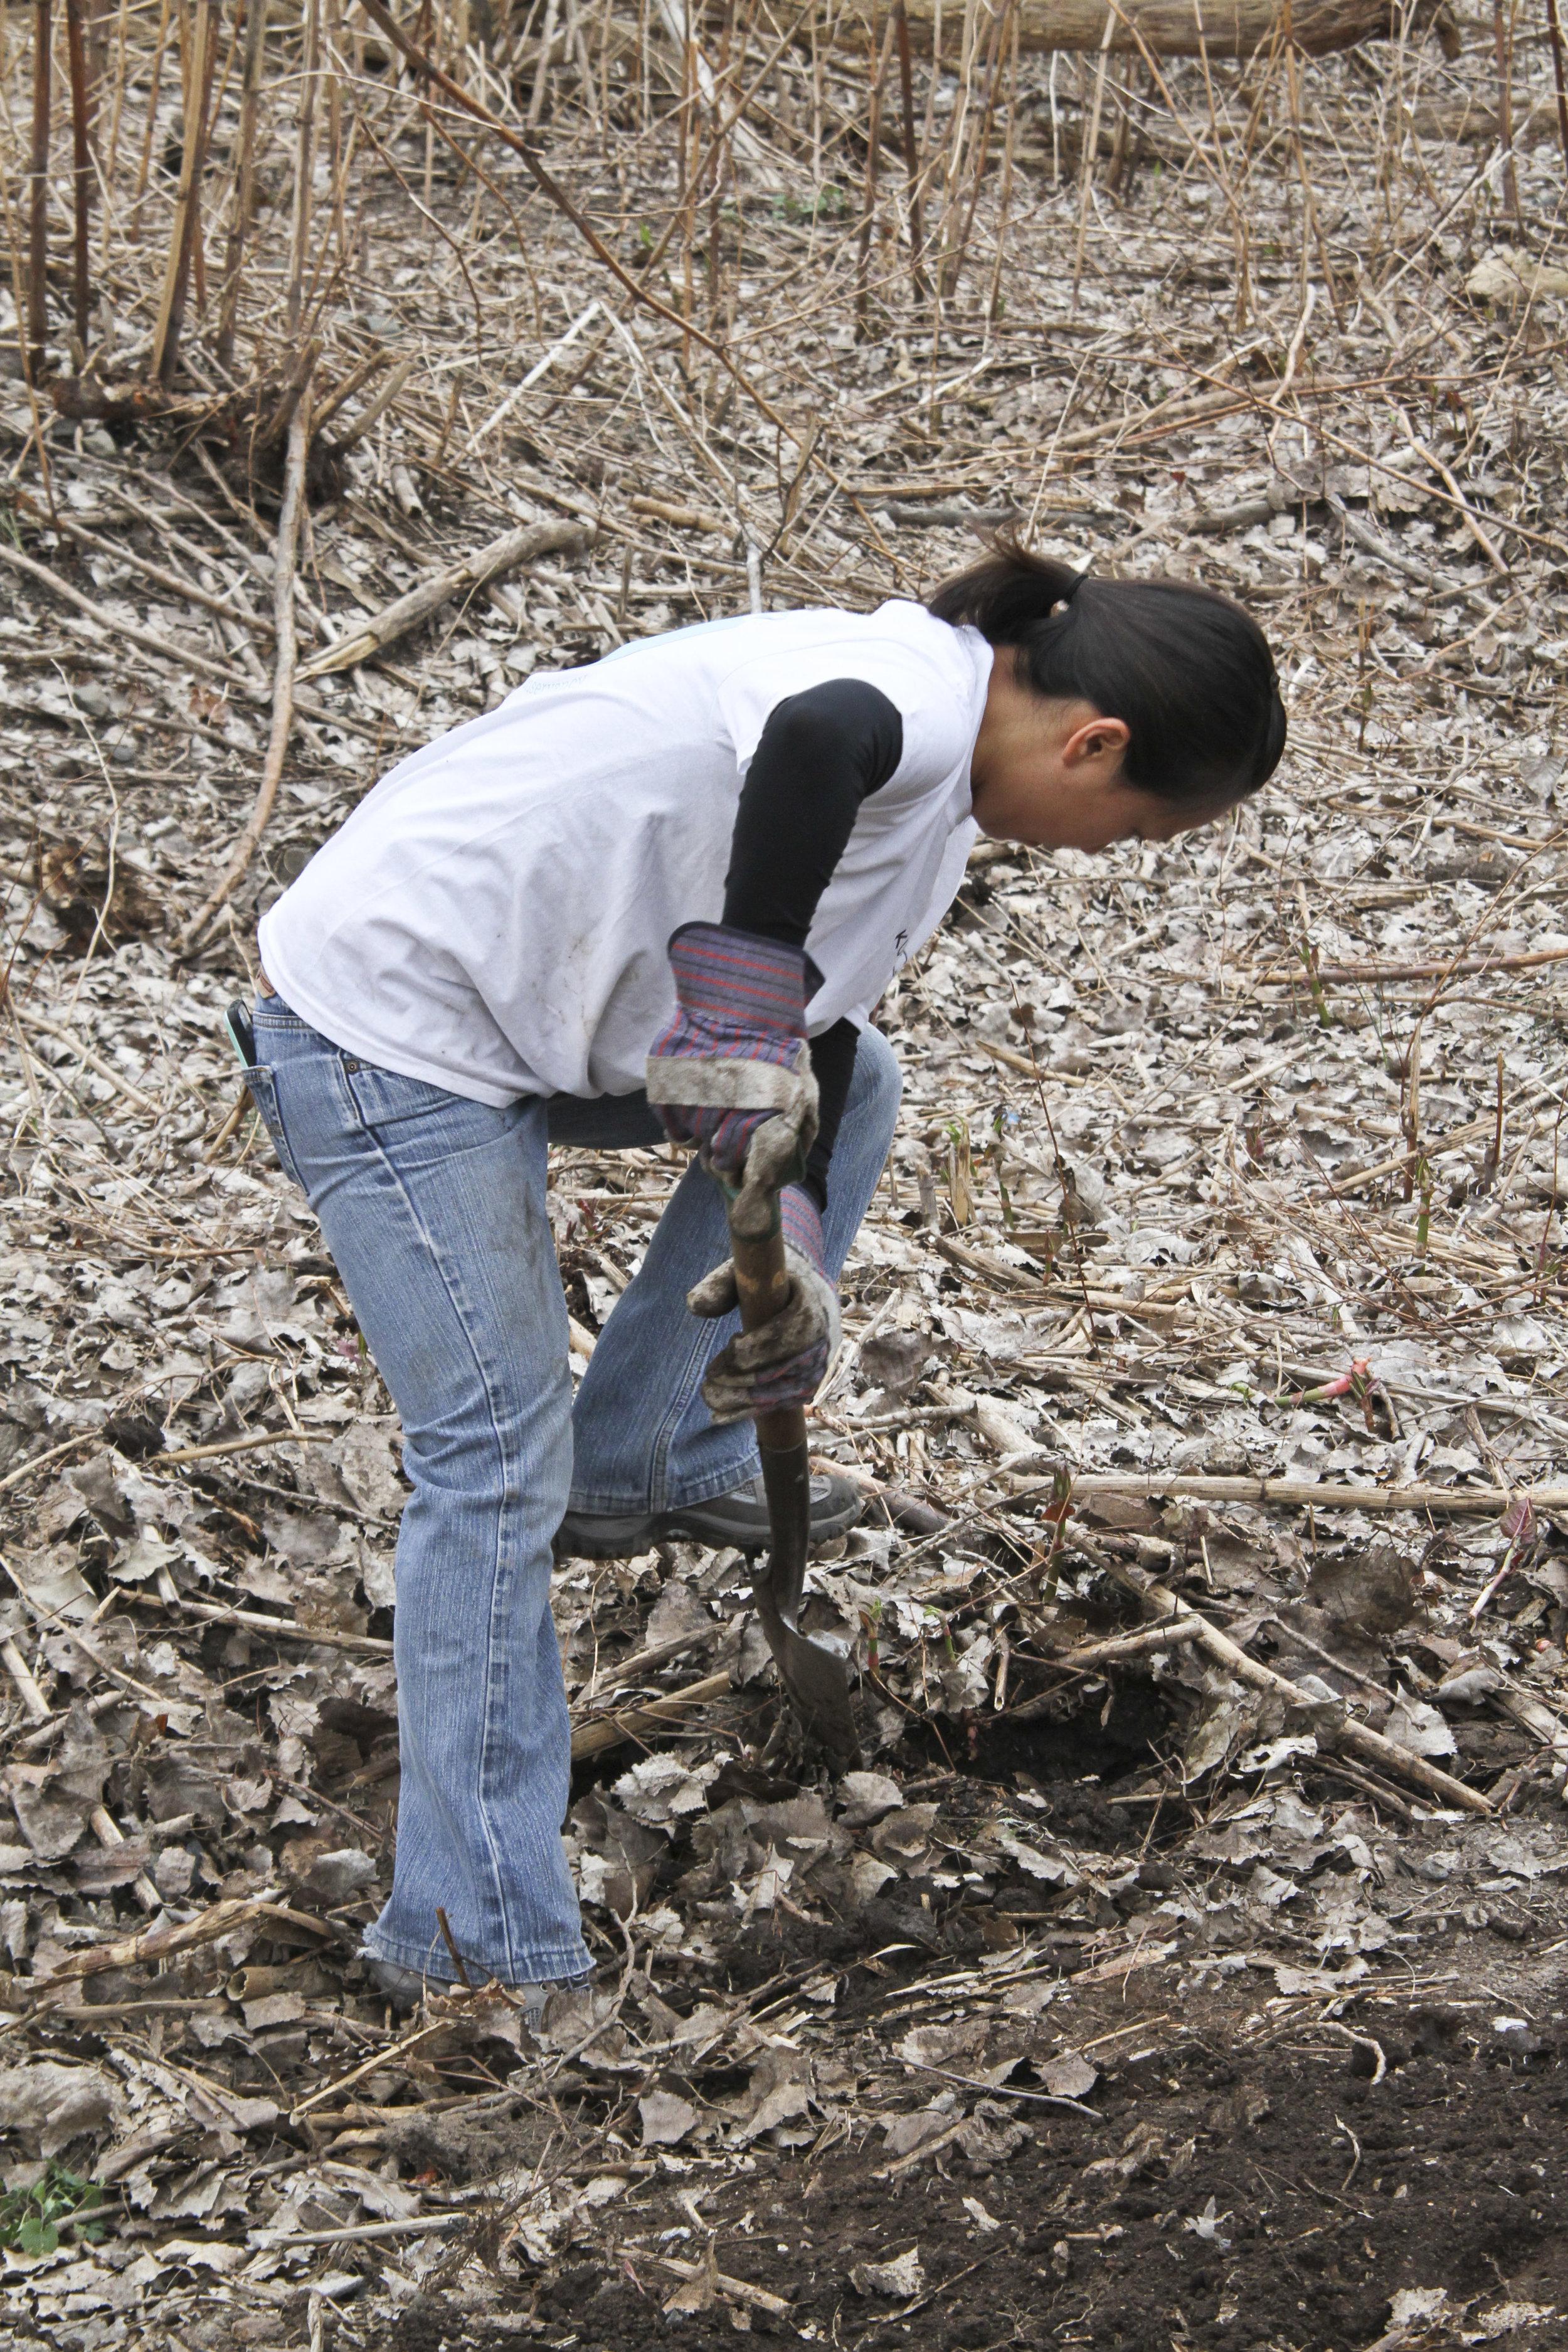 2017.04.12_Kumon Earth Day TCC_058.jpg